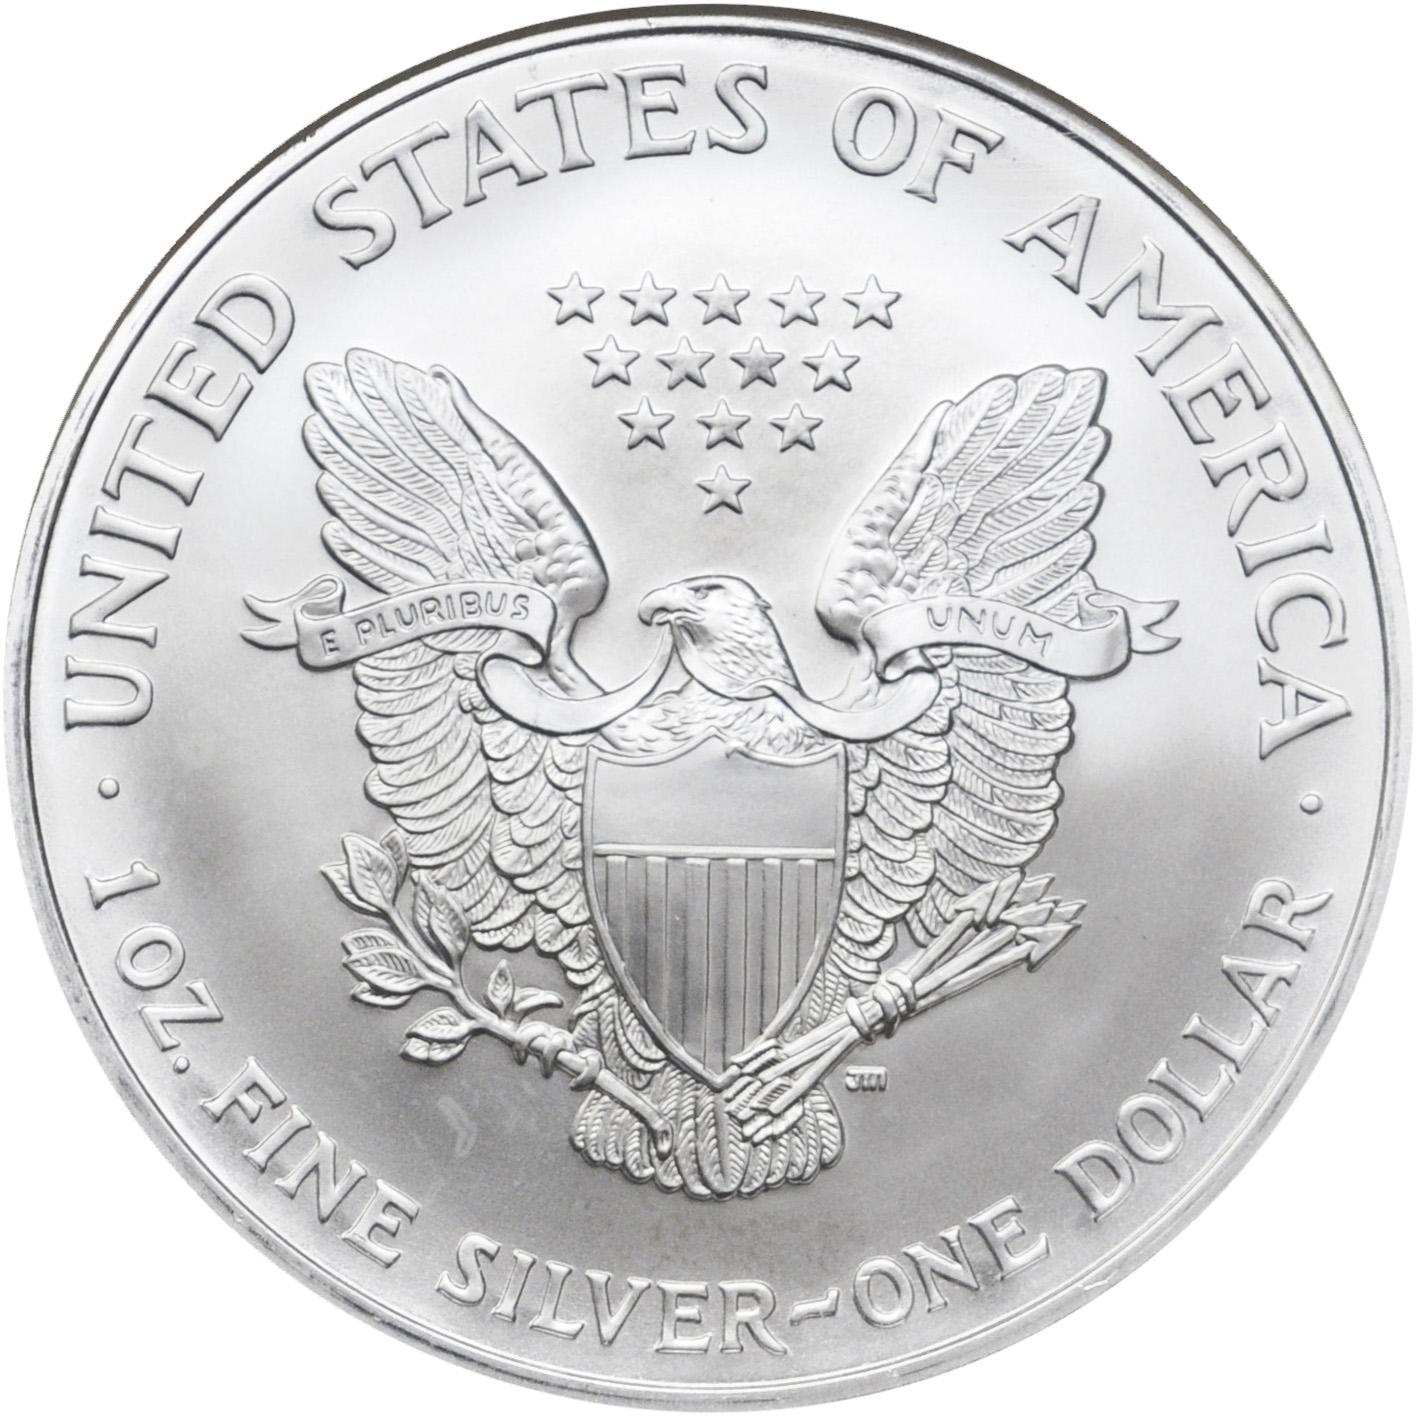 Value Of 2005 1 Silver Coin American Silver Eagle Coin